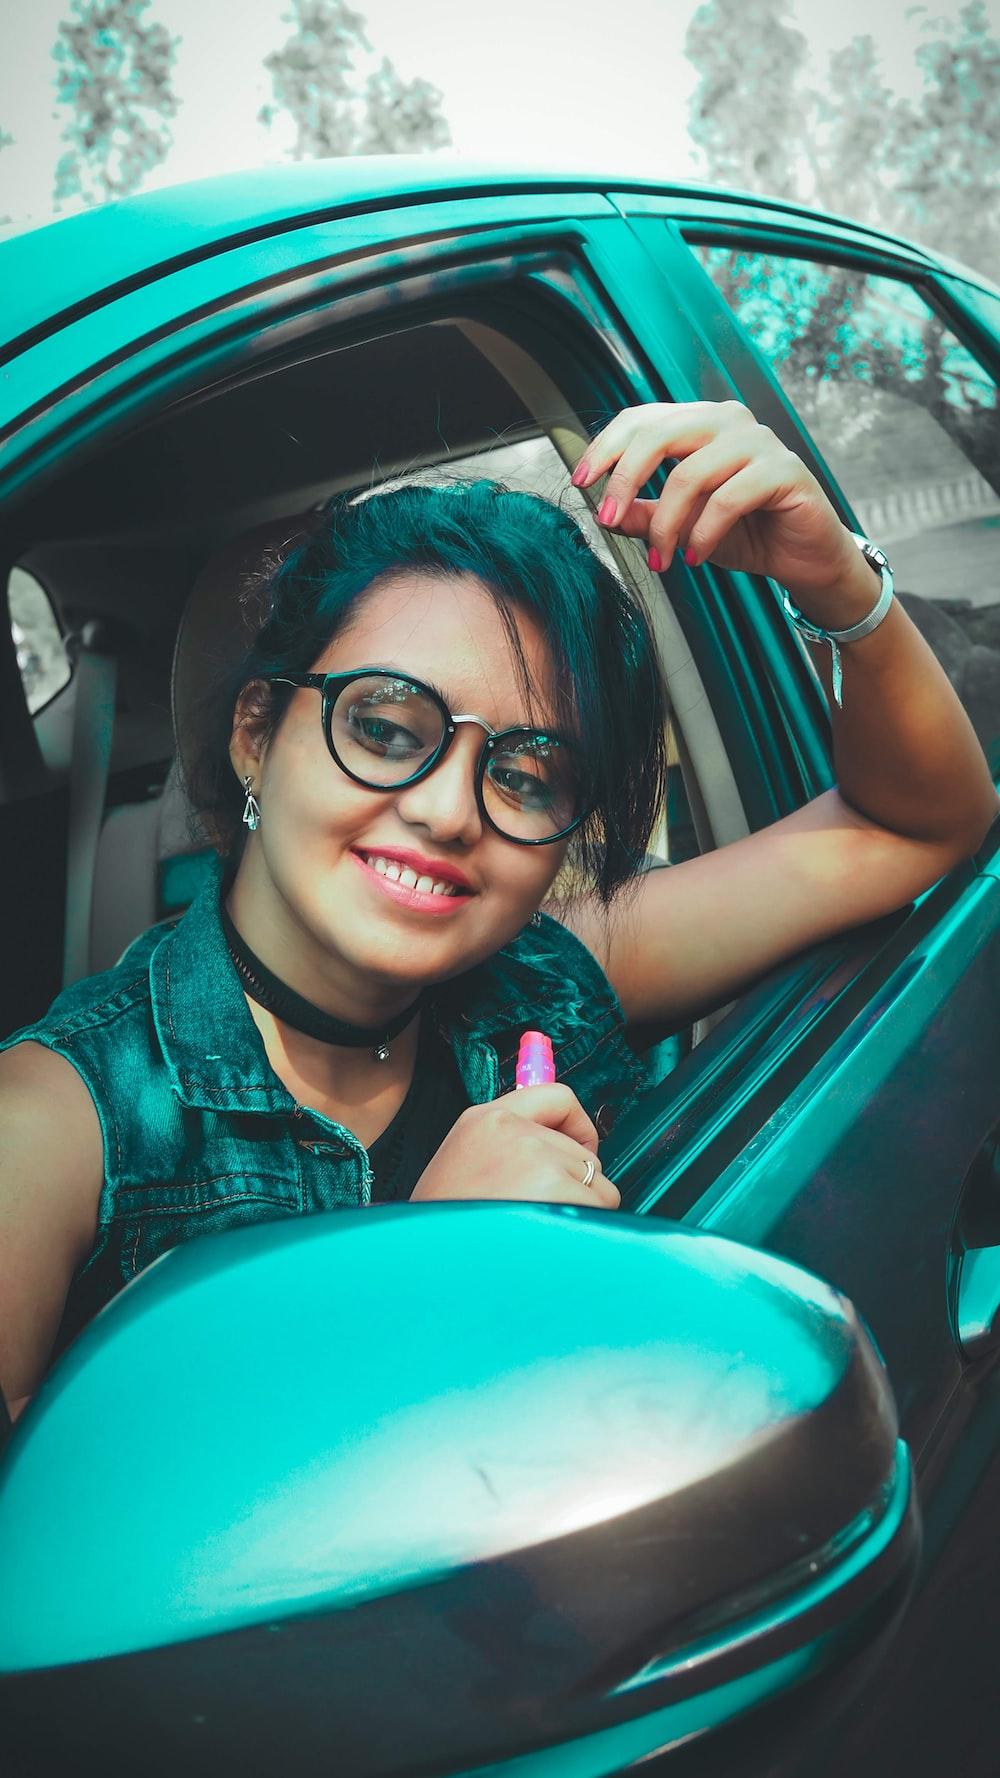 smiling woman wearing eyeglasses sitting inside vehicle\